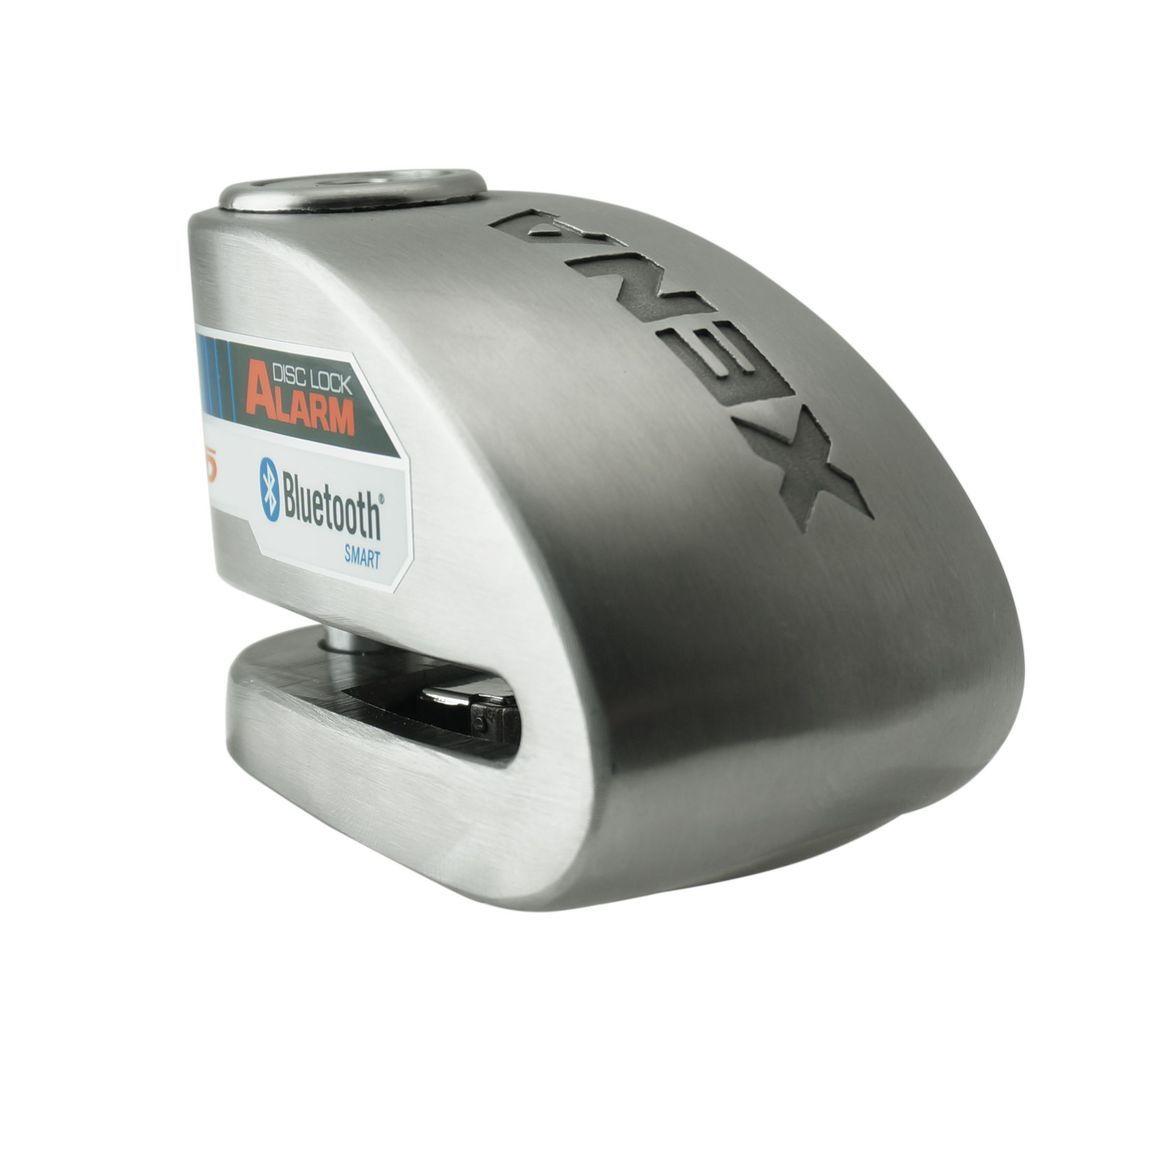 Antivol Bloc disque Xena XX6 - Bluetooth, Alarme 120dB